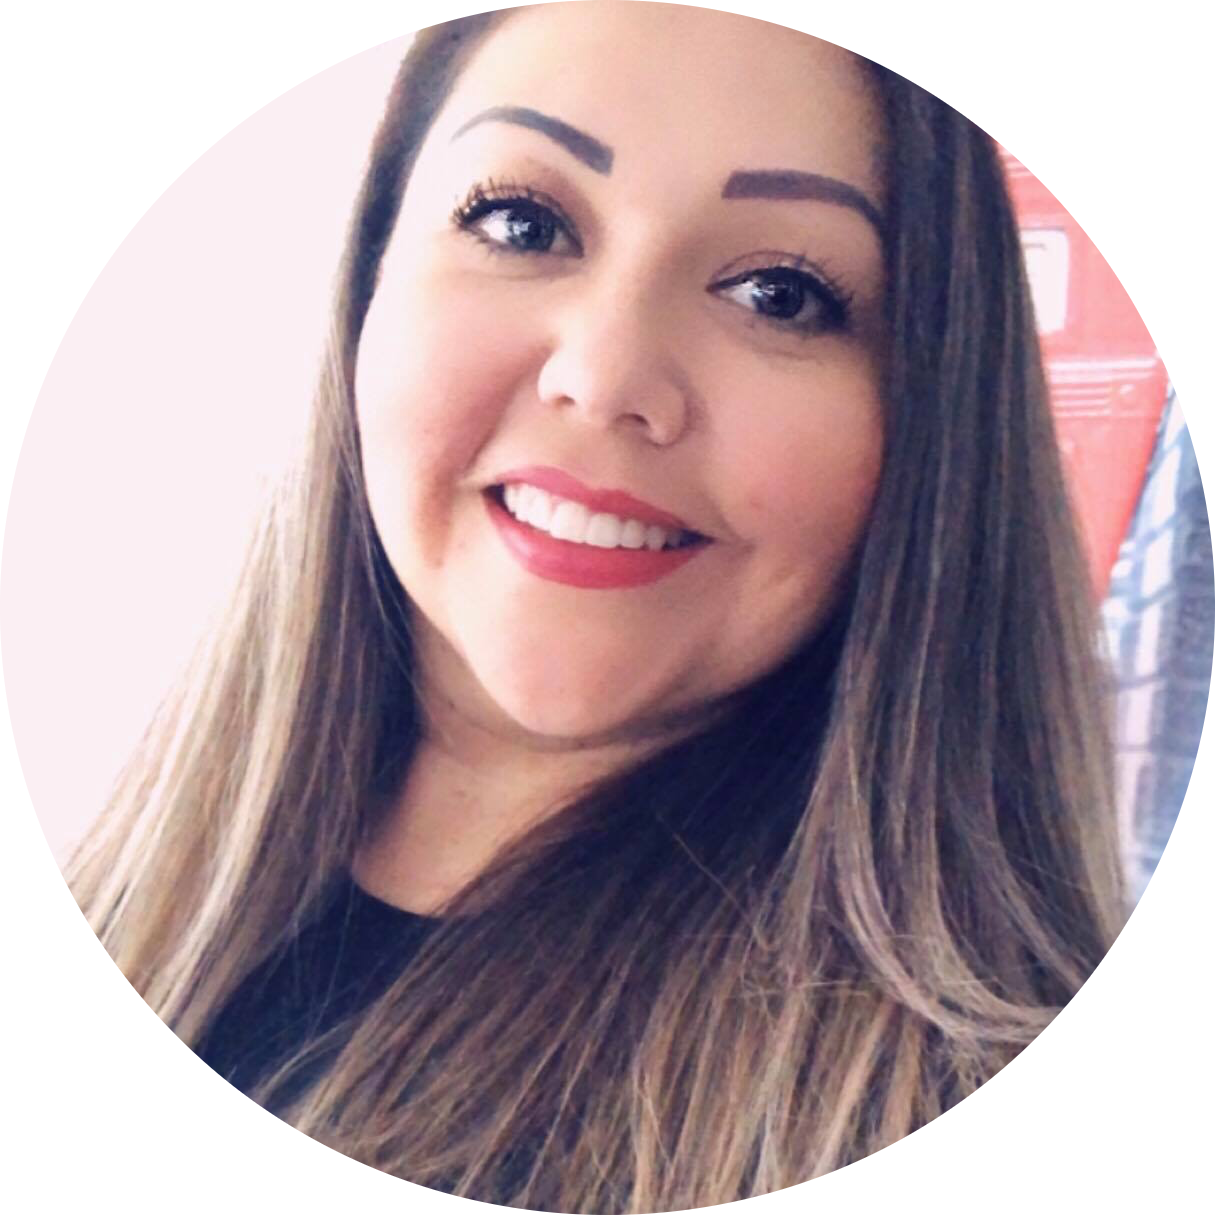 Dra. Rosario Enriquez